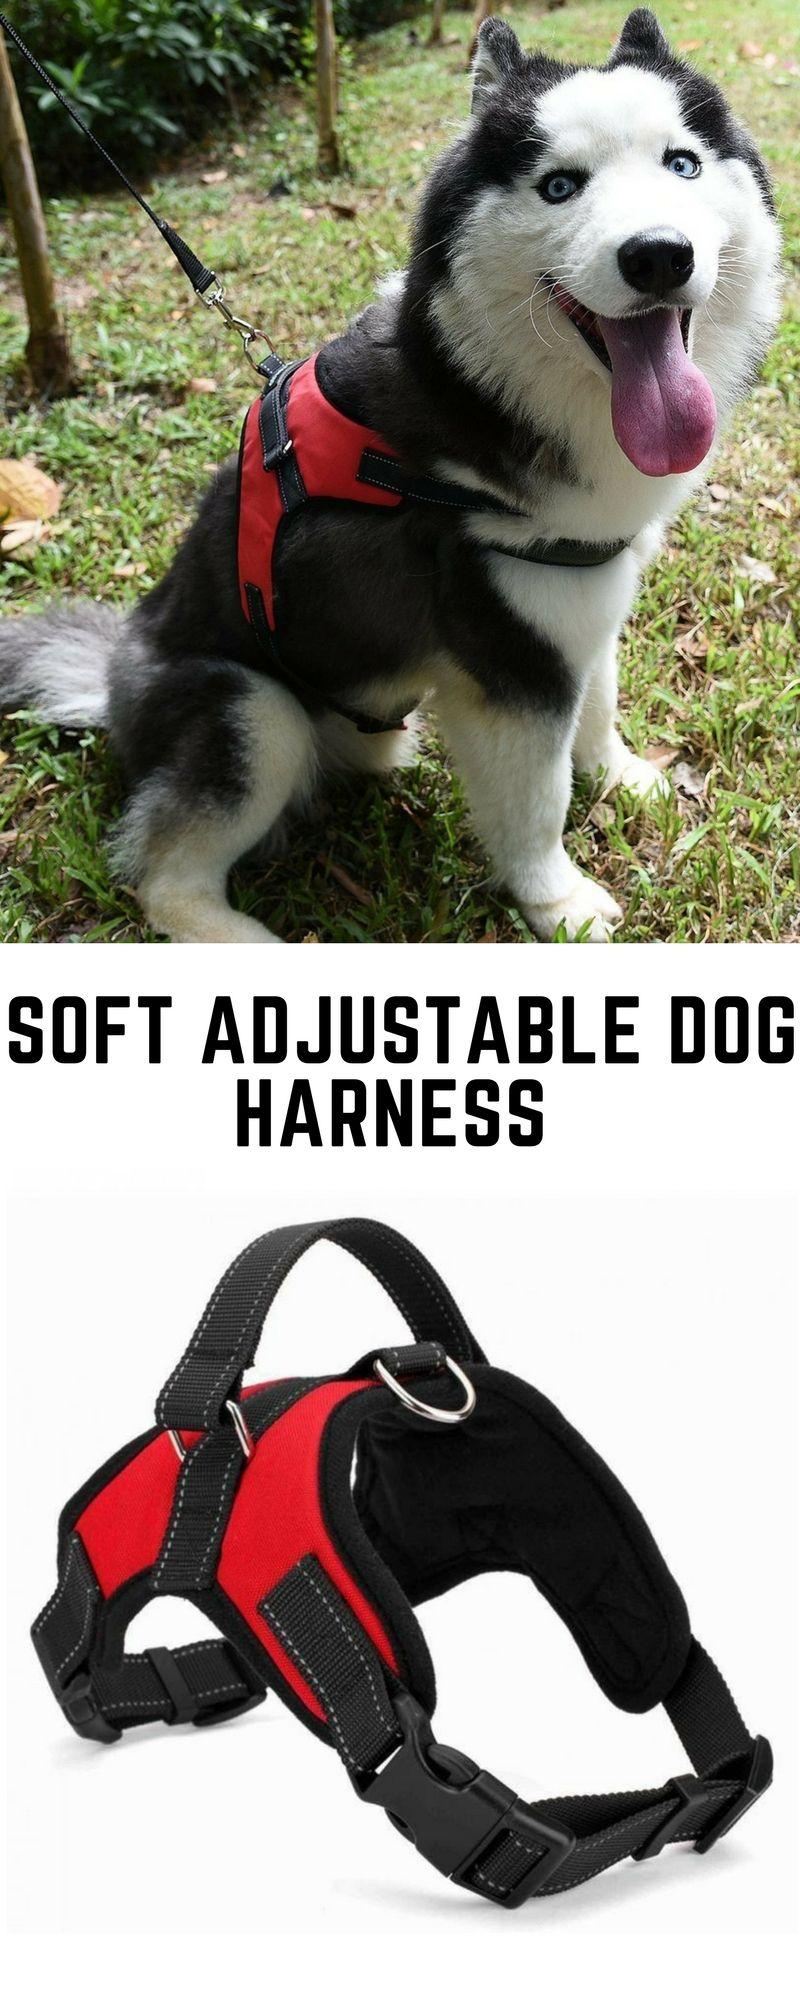 Soft Adjustable Dog Harness w/ Handle Dog harness, Funny